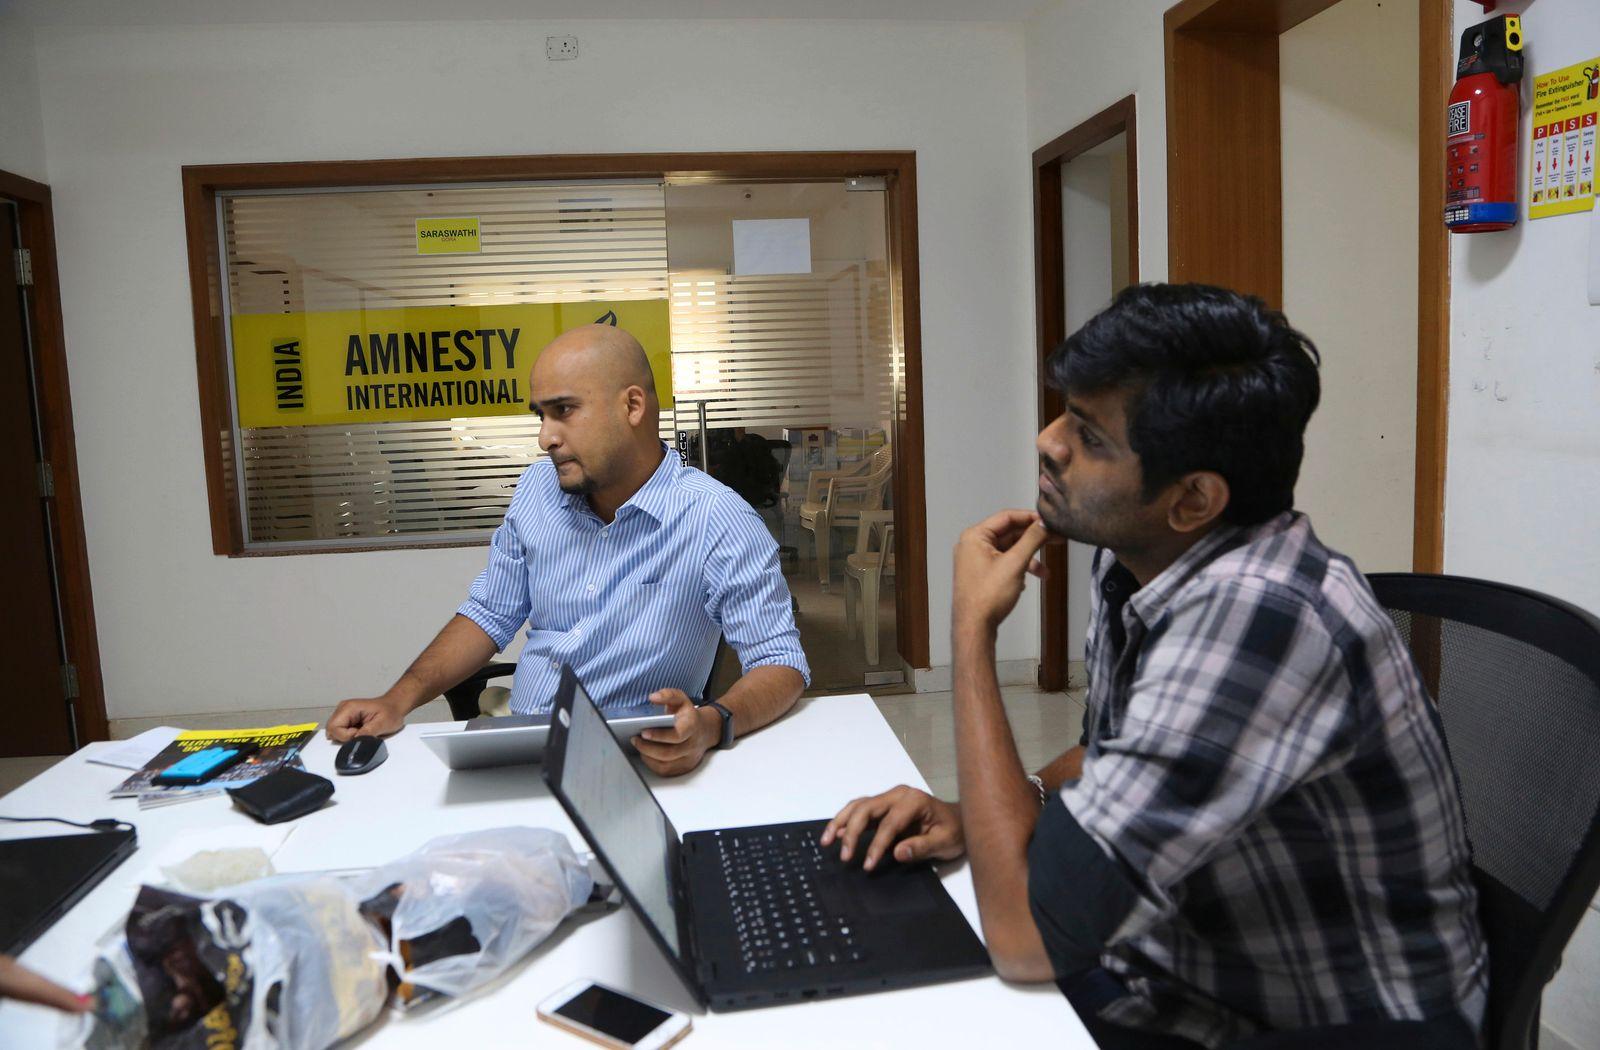 India Amnesty International